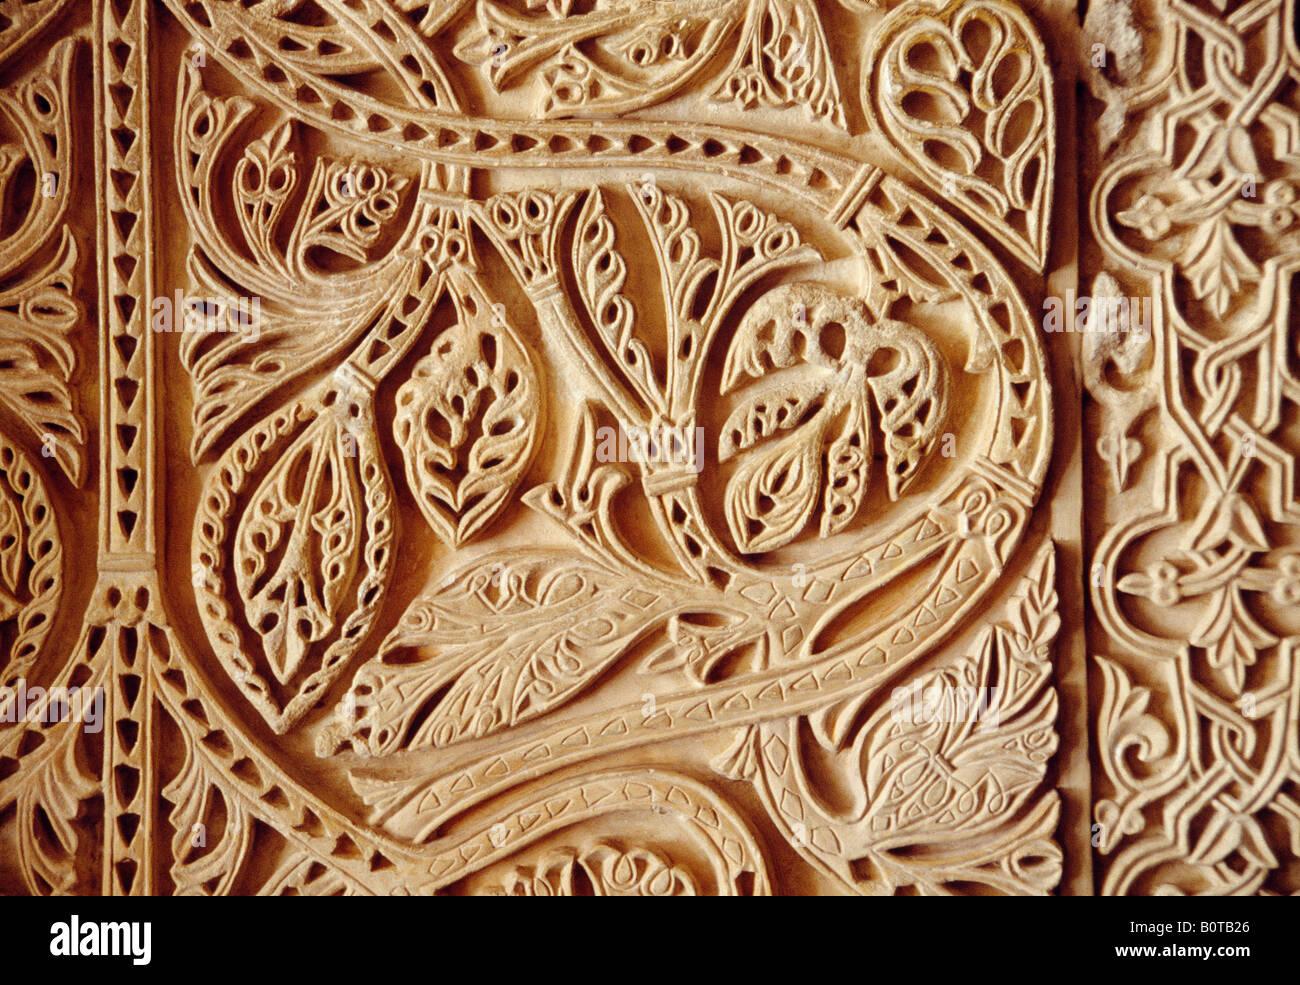 Detail of arabesque. Hall of Abd Al Rahman III. Medina Azahara. Cordoba province. Andalusia. Spain. - Stock Image